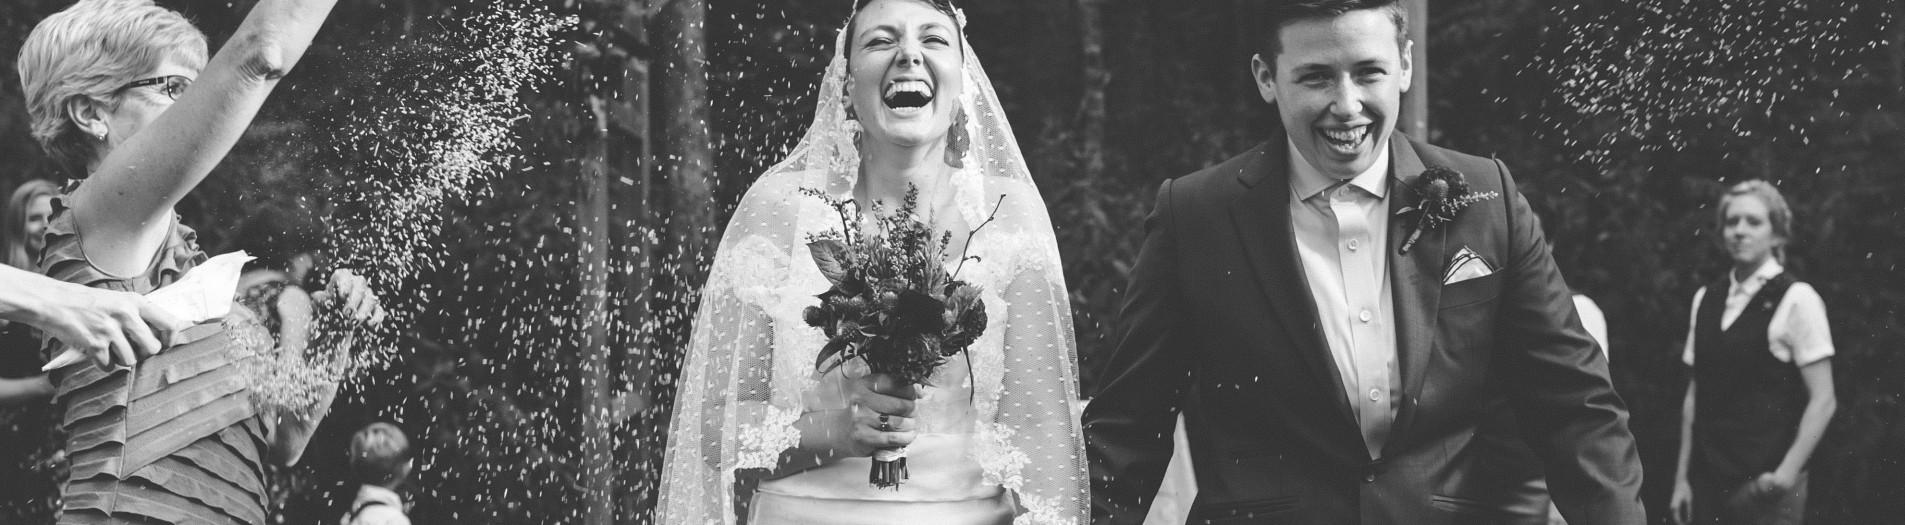 Victoria + Jessie | Vibrant Rock Quarry Farm Wedding